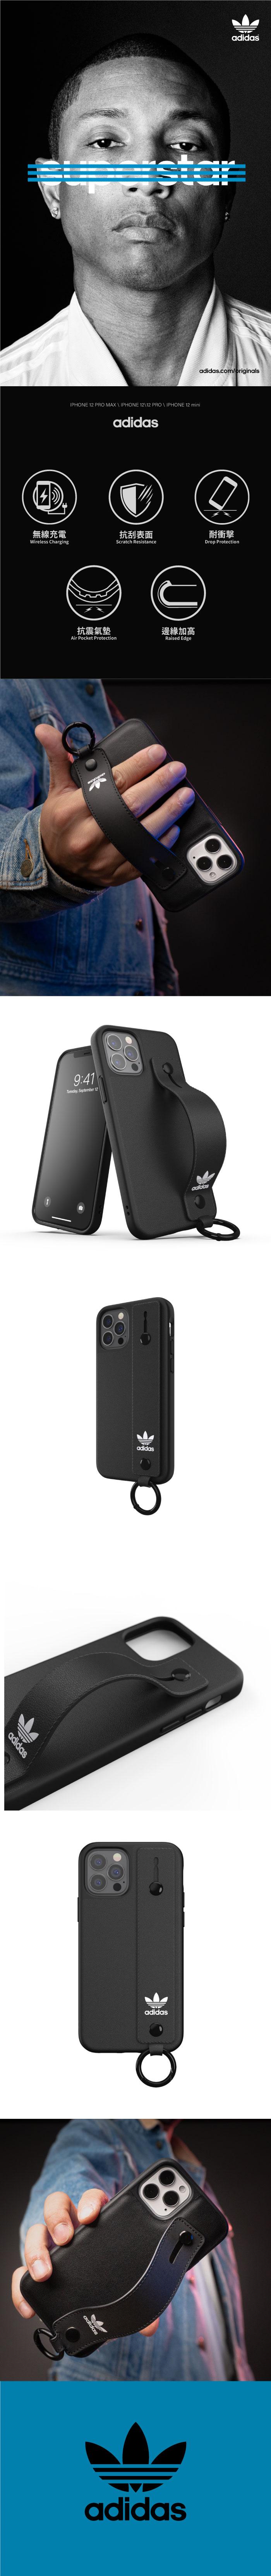 Adidas iPhone 12/12 Pro 手機殼 Originals 支架扣環